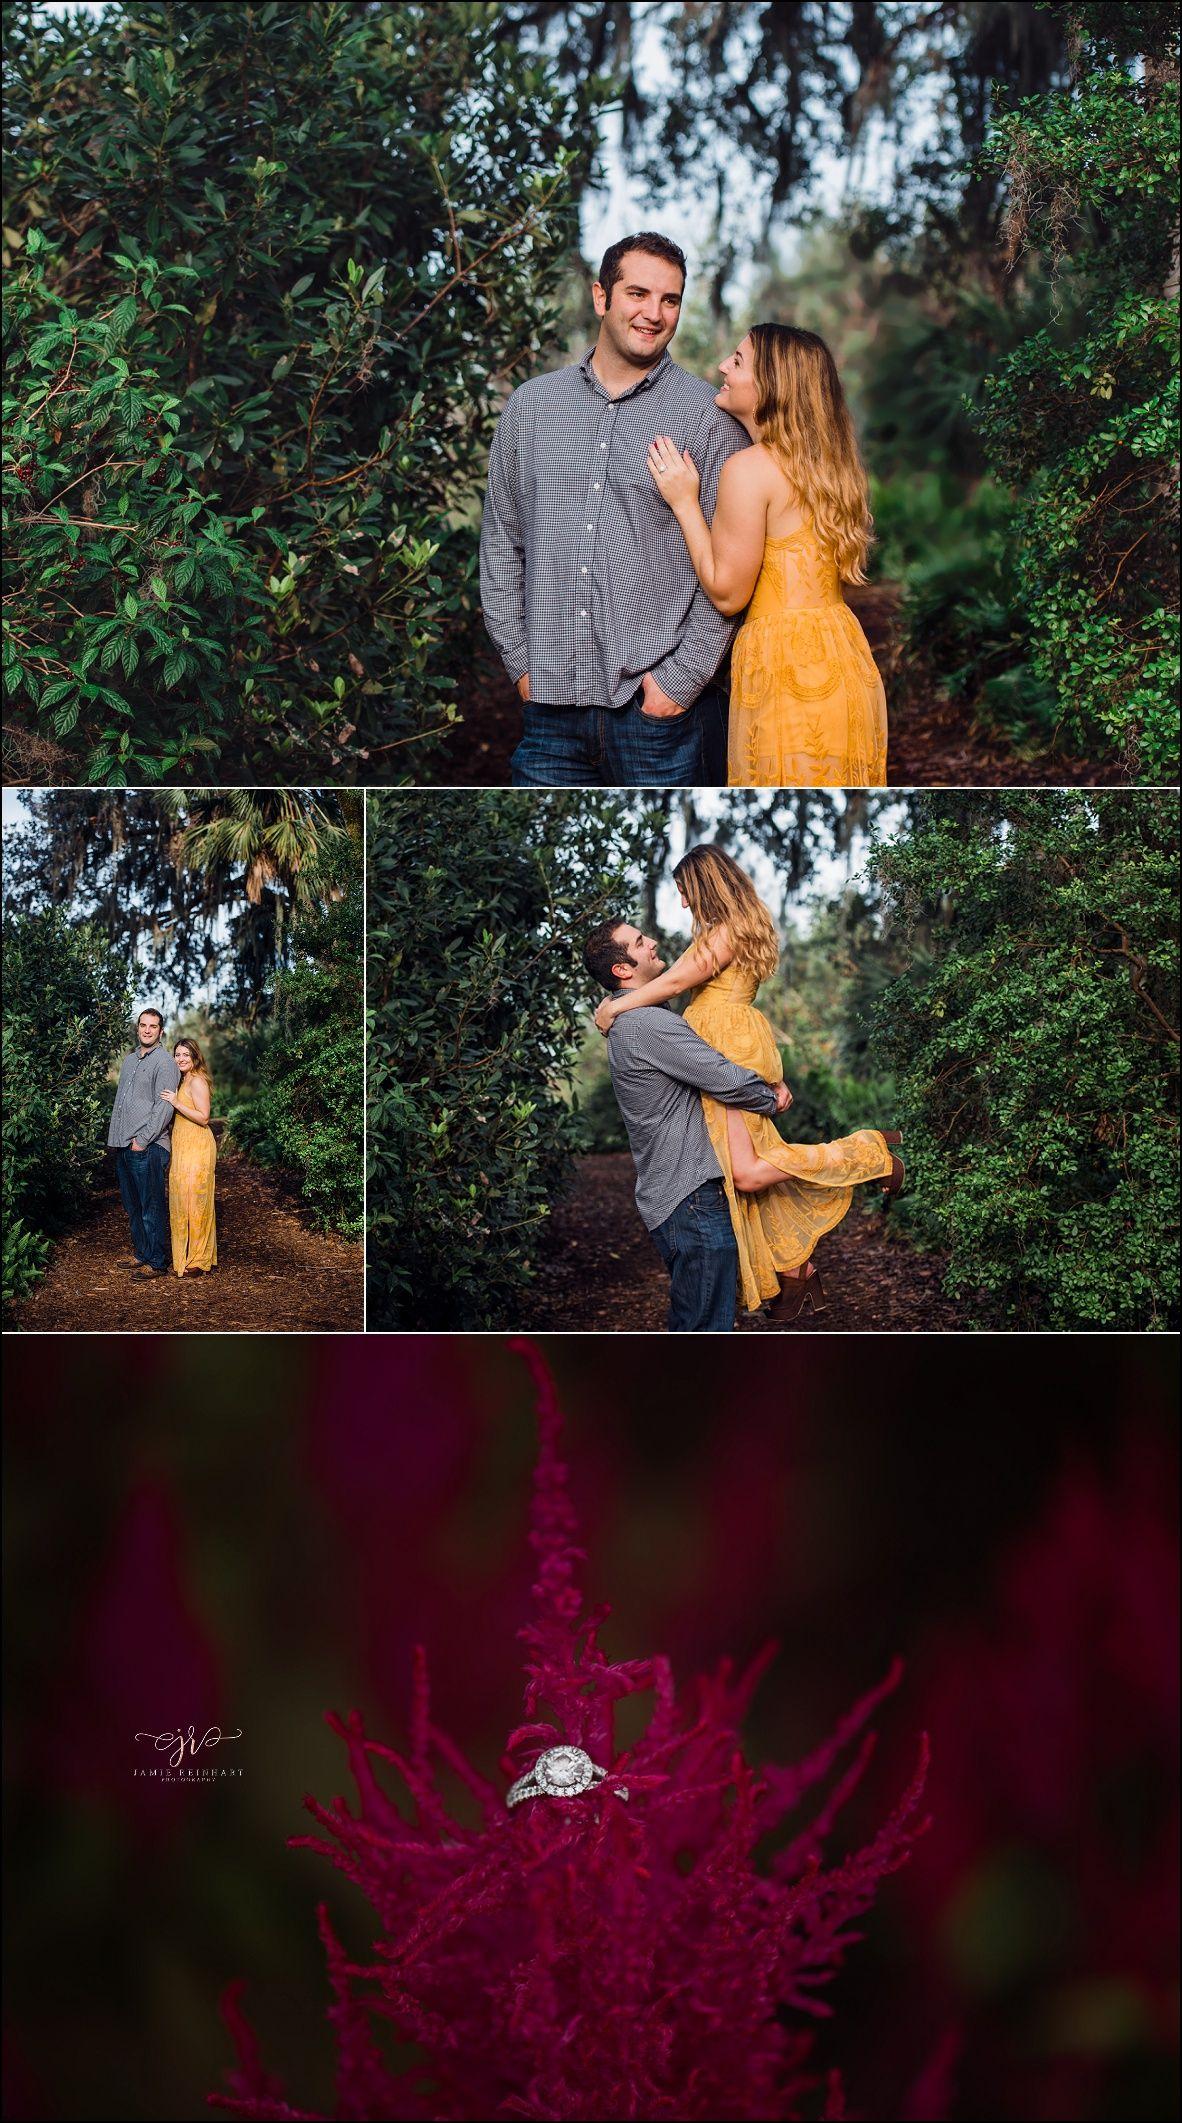 Best dress to wear to a garden wedding  Bok Tower Gardens Engagement Session  Engagement session